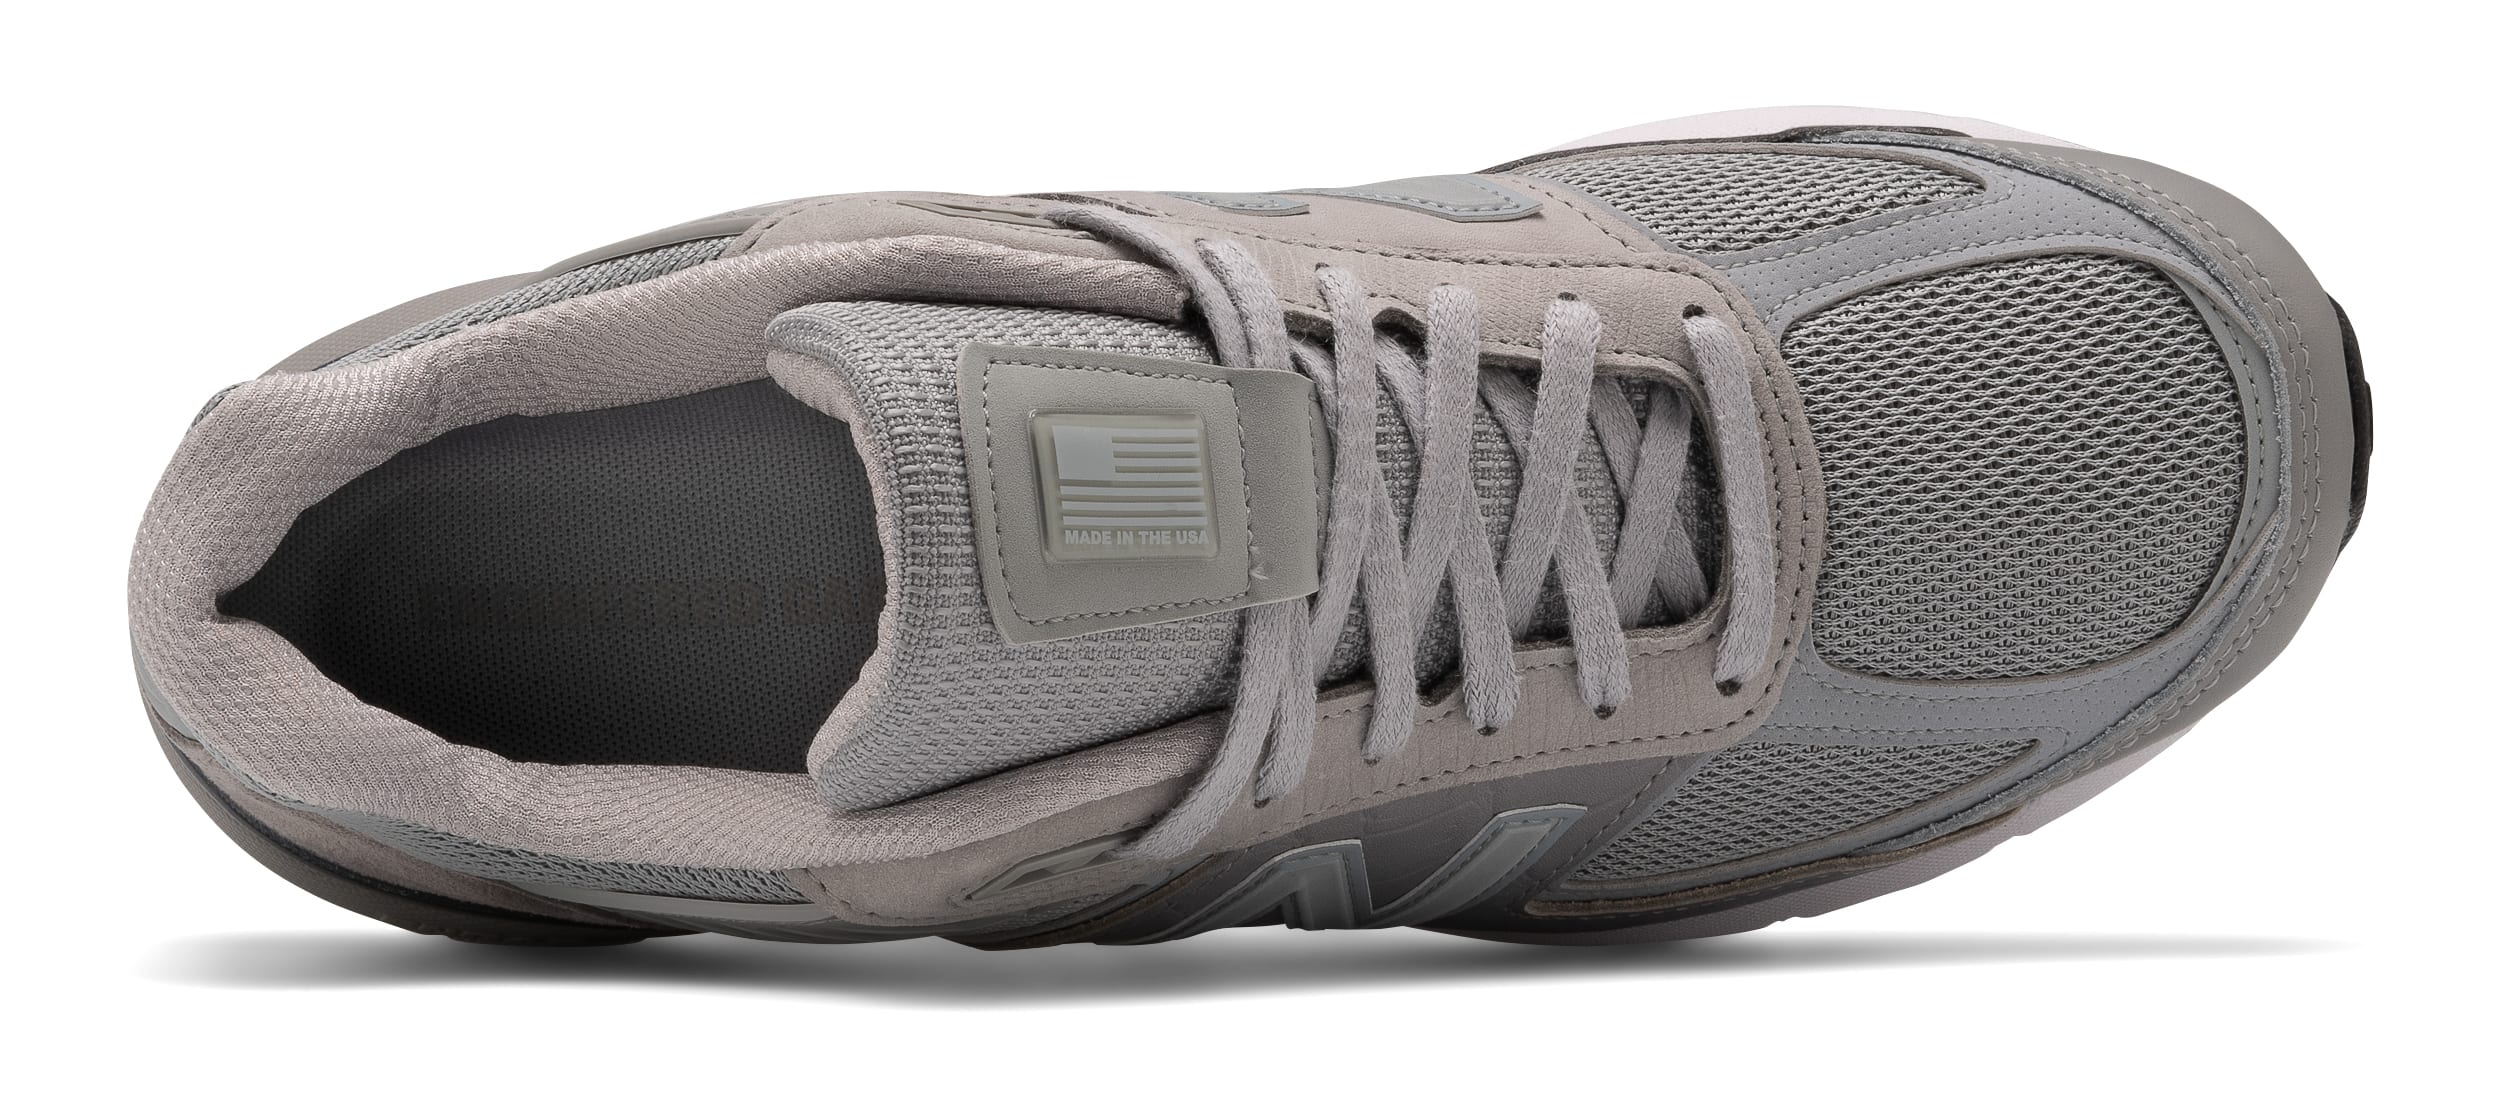 engineered-garments-new-balance-990v5-grey-top